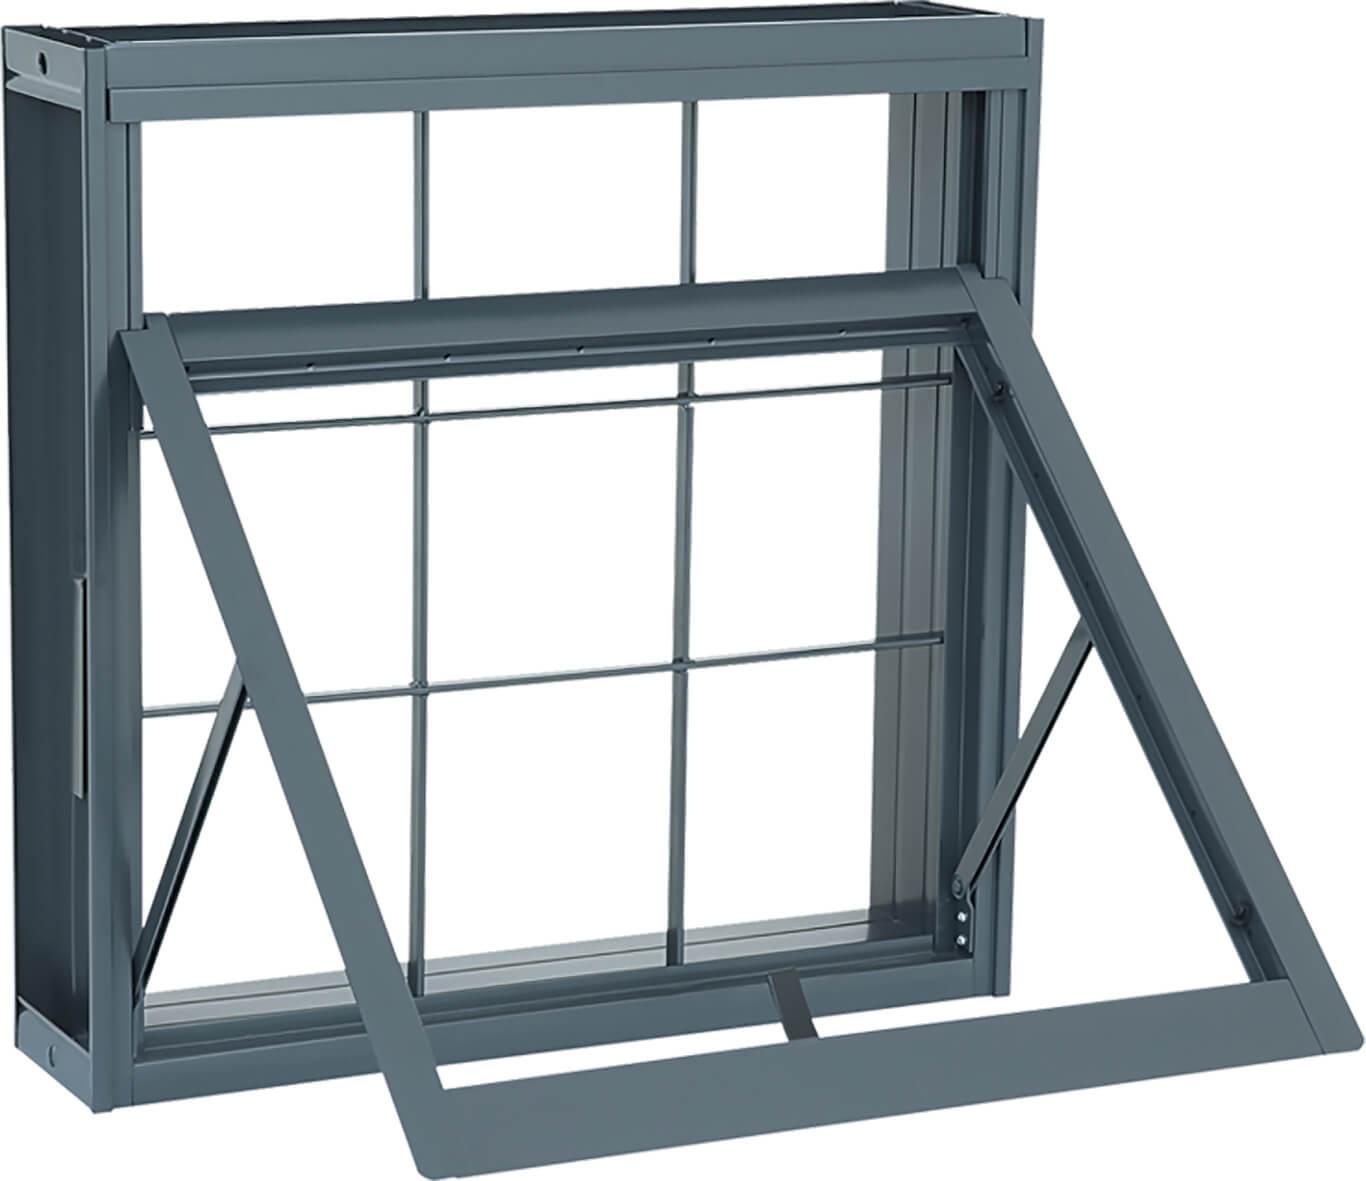 Silenfort Janela Maxim-Ar - 0.60x0.80x14 Sasazaki Ref. 64.34.202-9